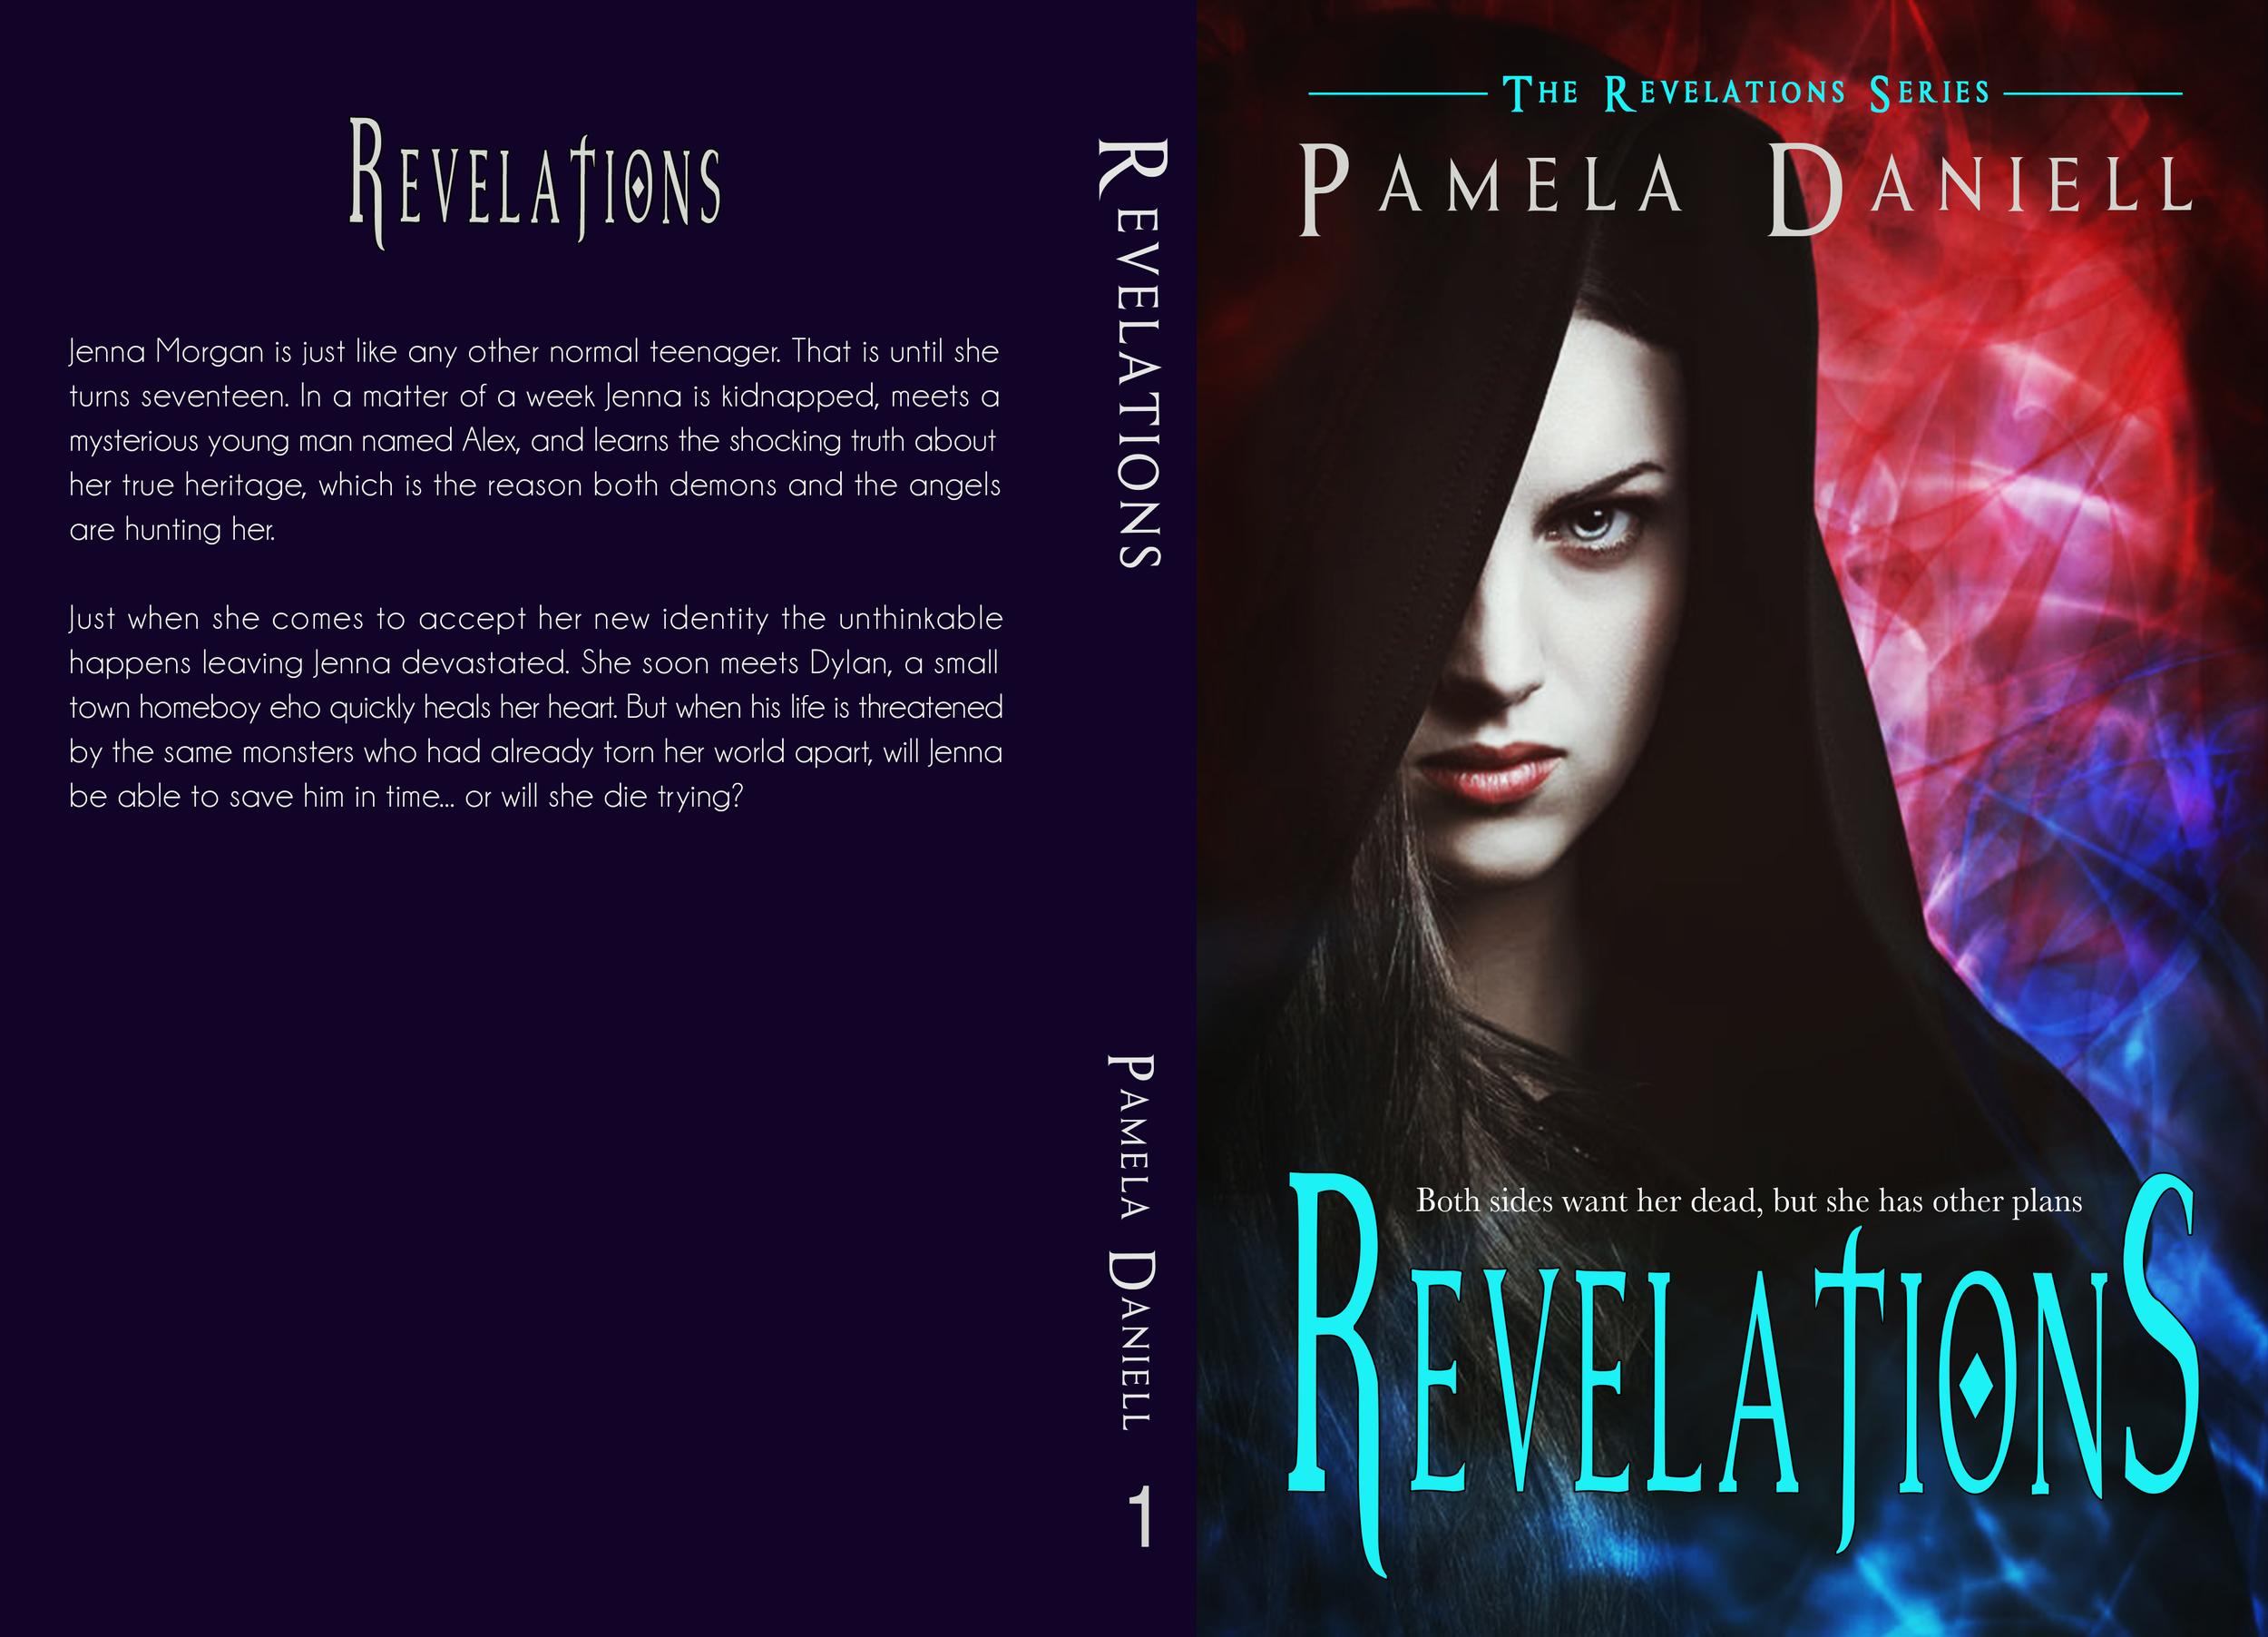 Pam paperback concept copy.jpg